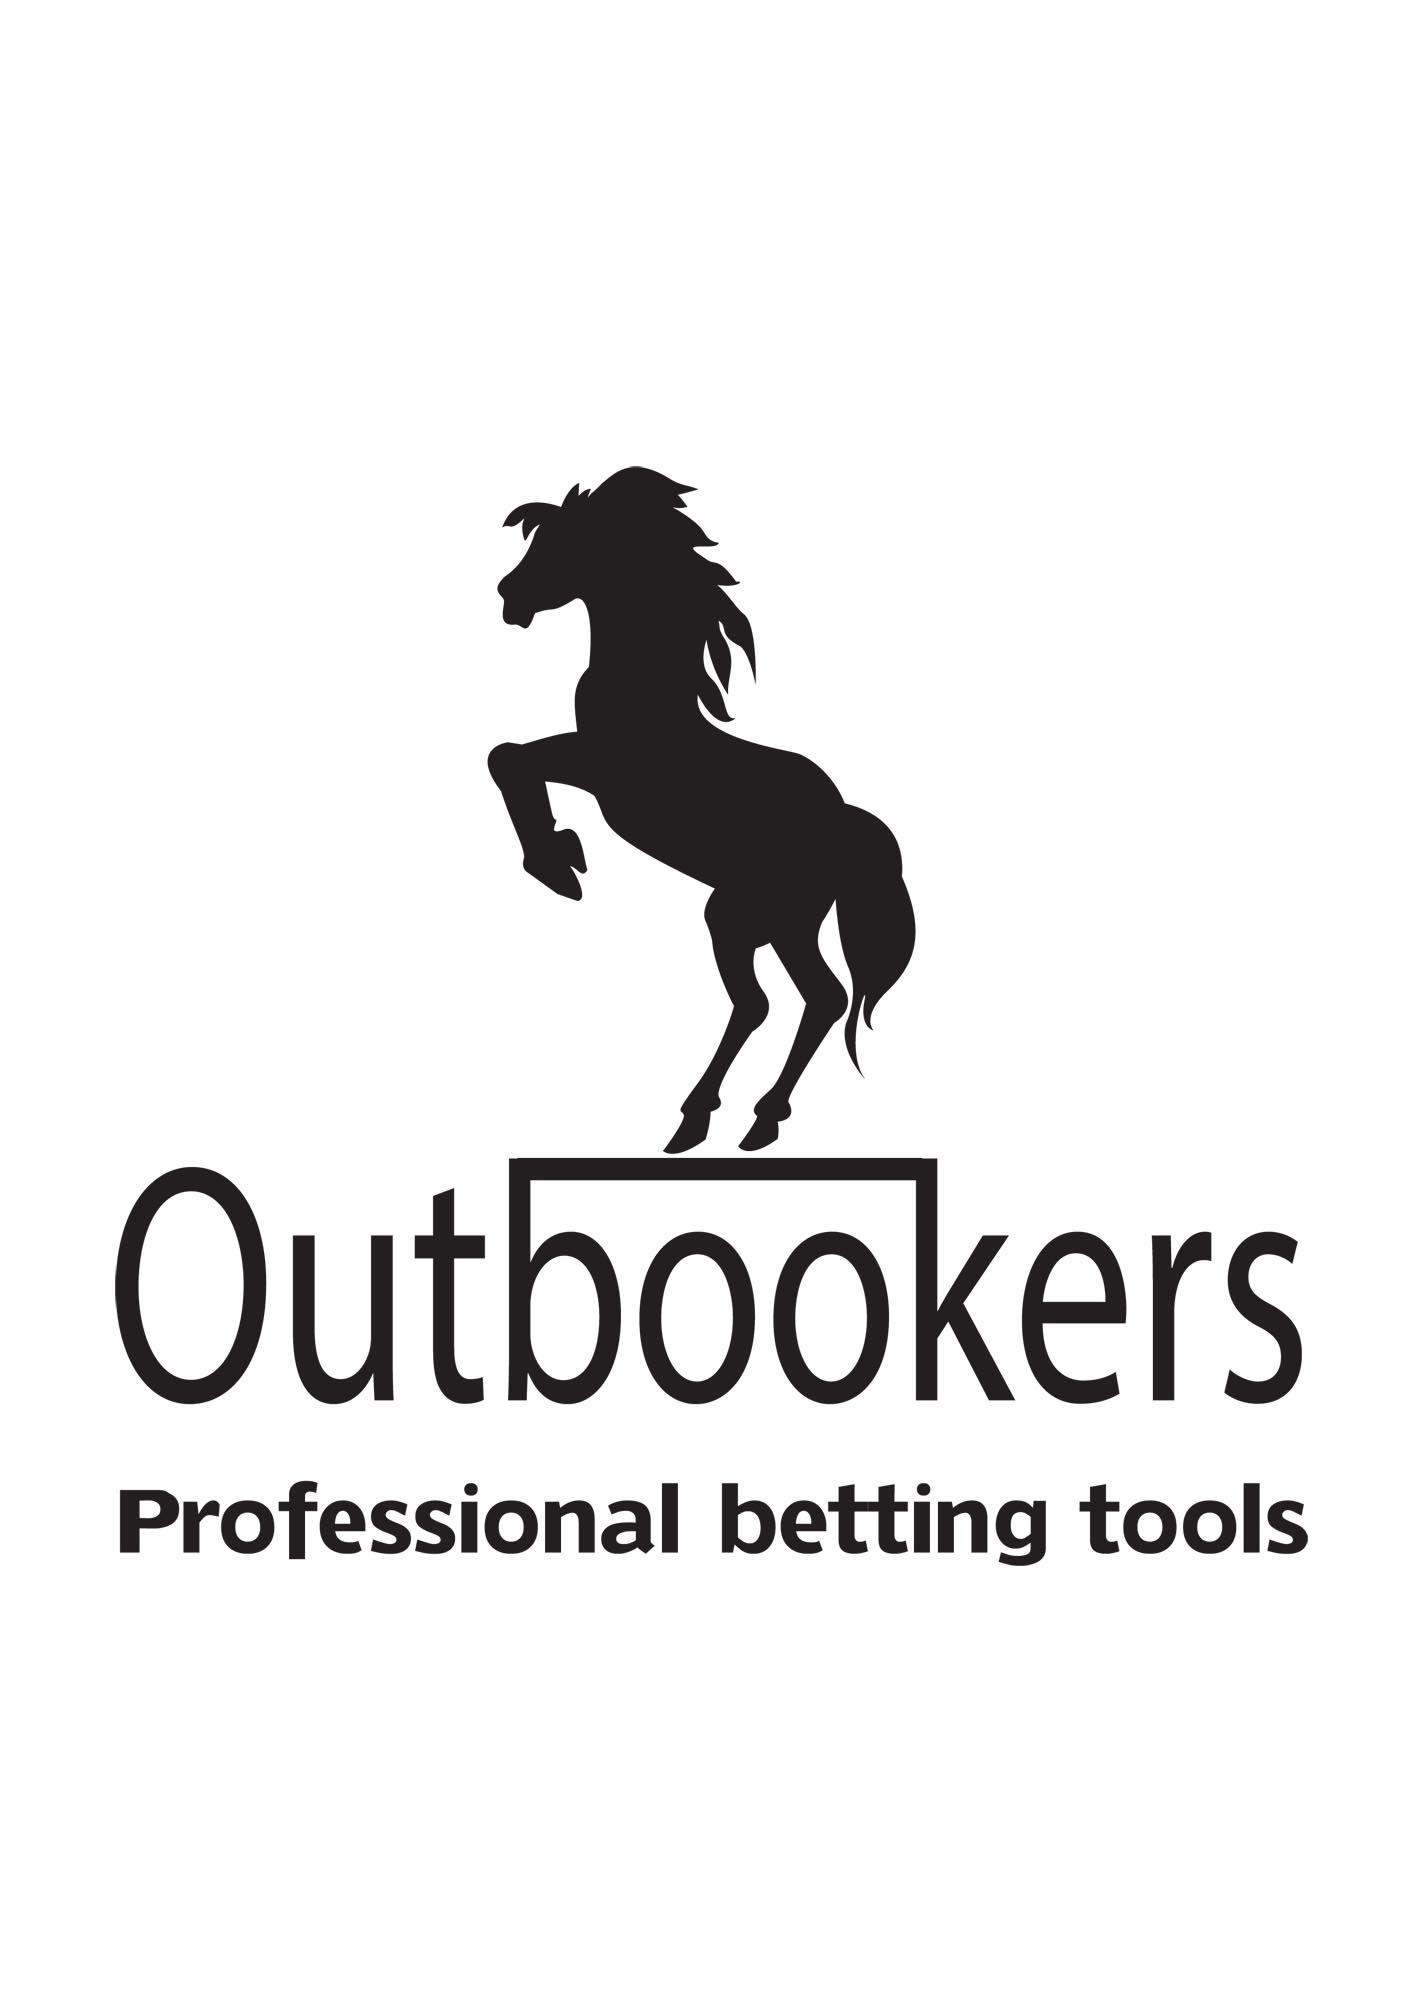 Образ лошади в логотипе (спортивная аналитика) - дизайнер Shmaki